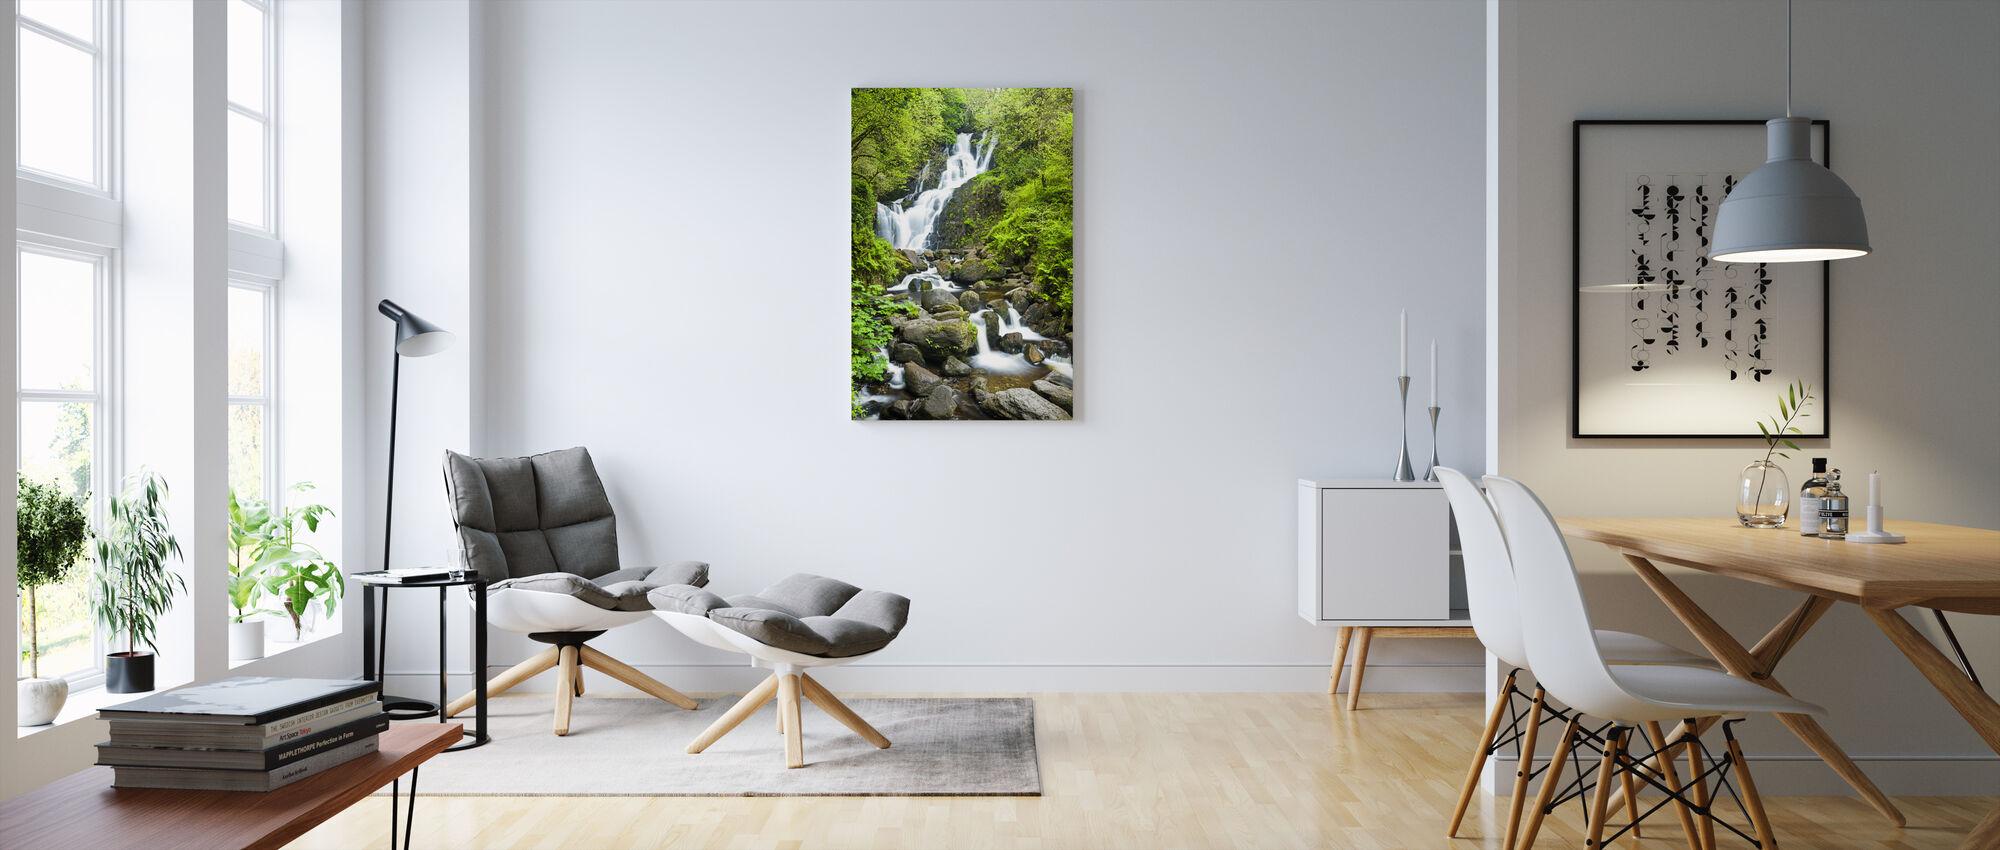 Torc-vesiputous - Canvastaulu - Olohuone